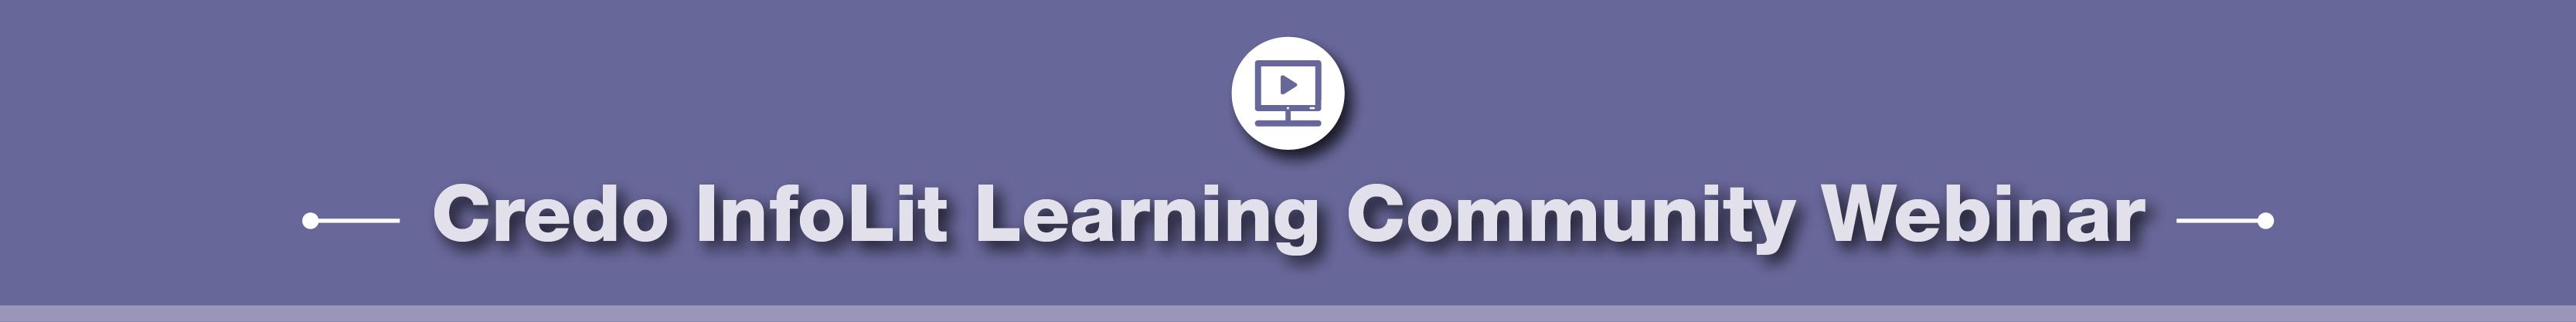 InfoLit_LC_Webinars_LandingPageHeader_1600x200